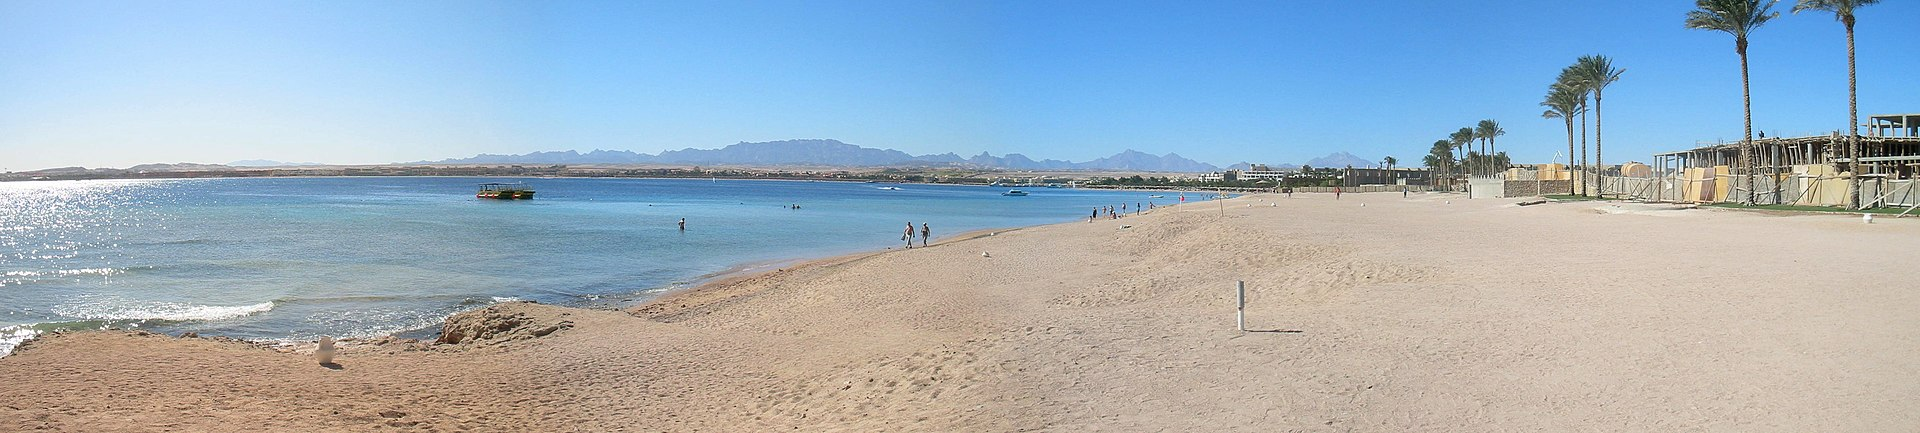 Hurghada, Qesm Hurghada, Red Sea Governorate, Egypt - panoramio - Figure (5).jpg